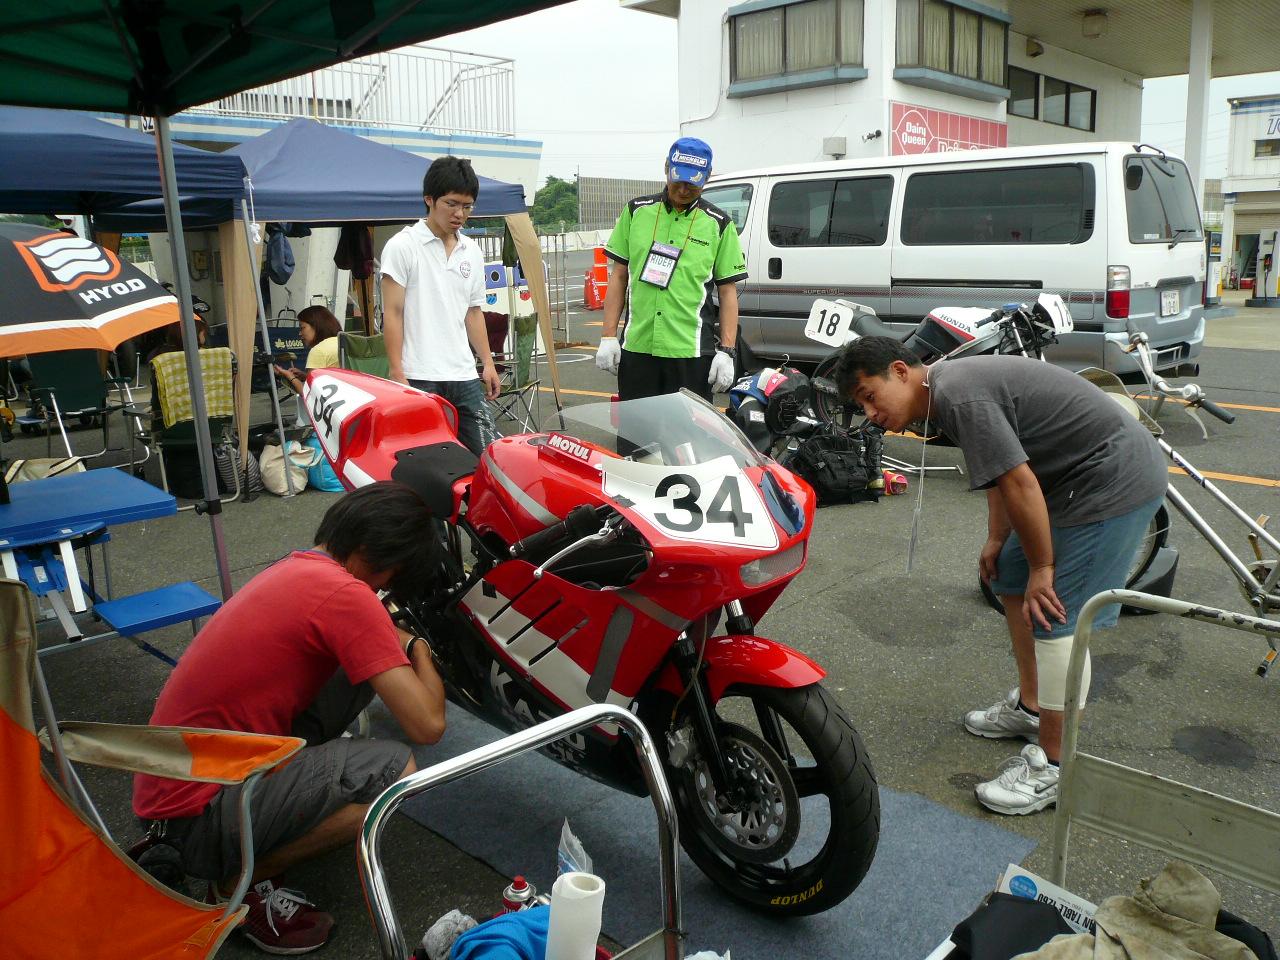 http://img.blogs.yahoo.co.jp/ybi/1/13/f5/tetsutaro499/folder/420377/img_420377_48531523_9?1246460044